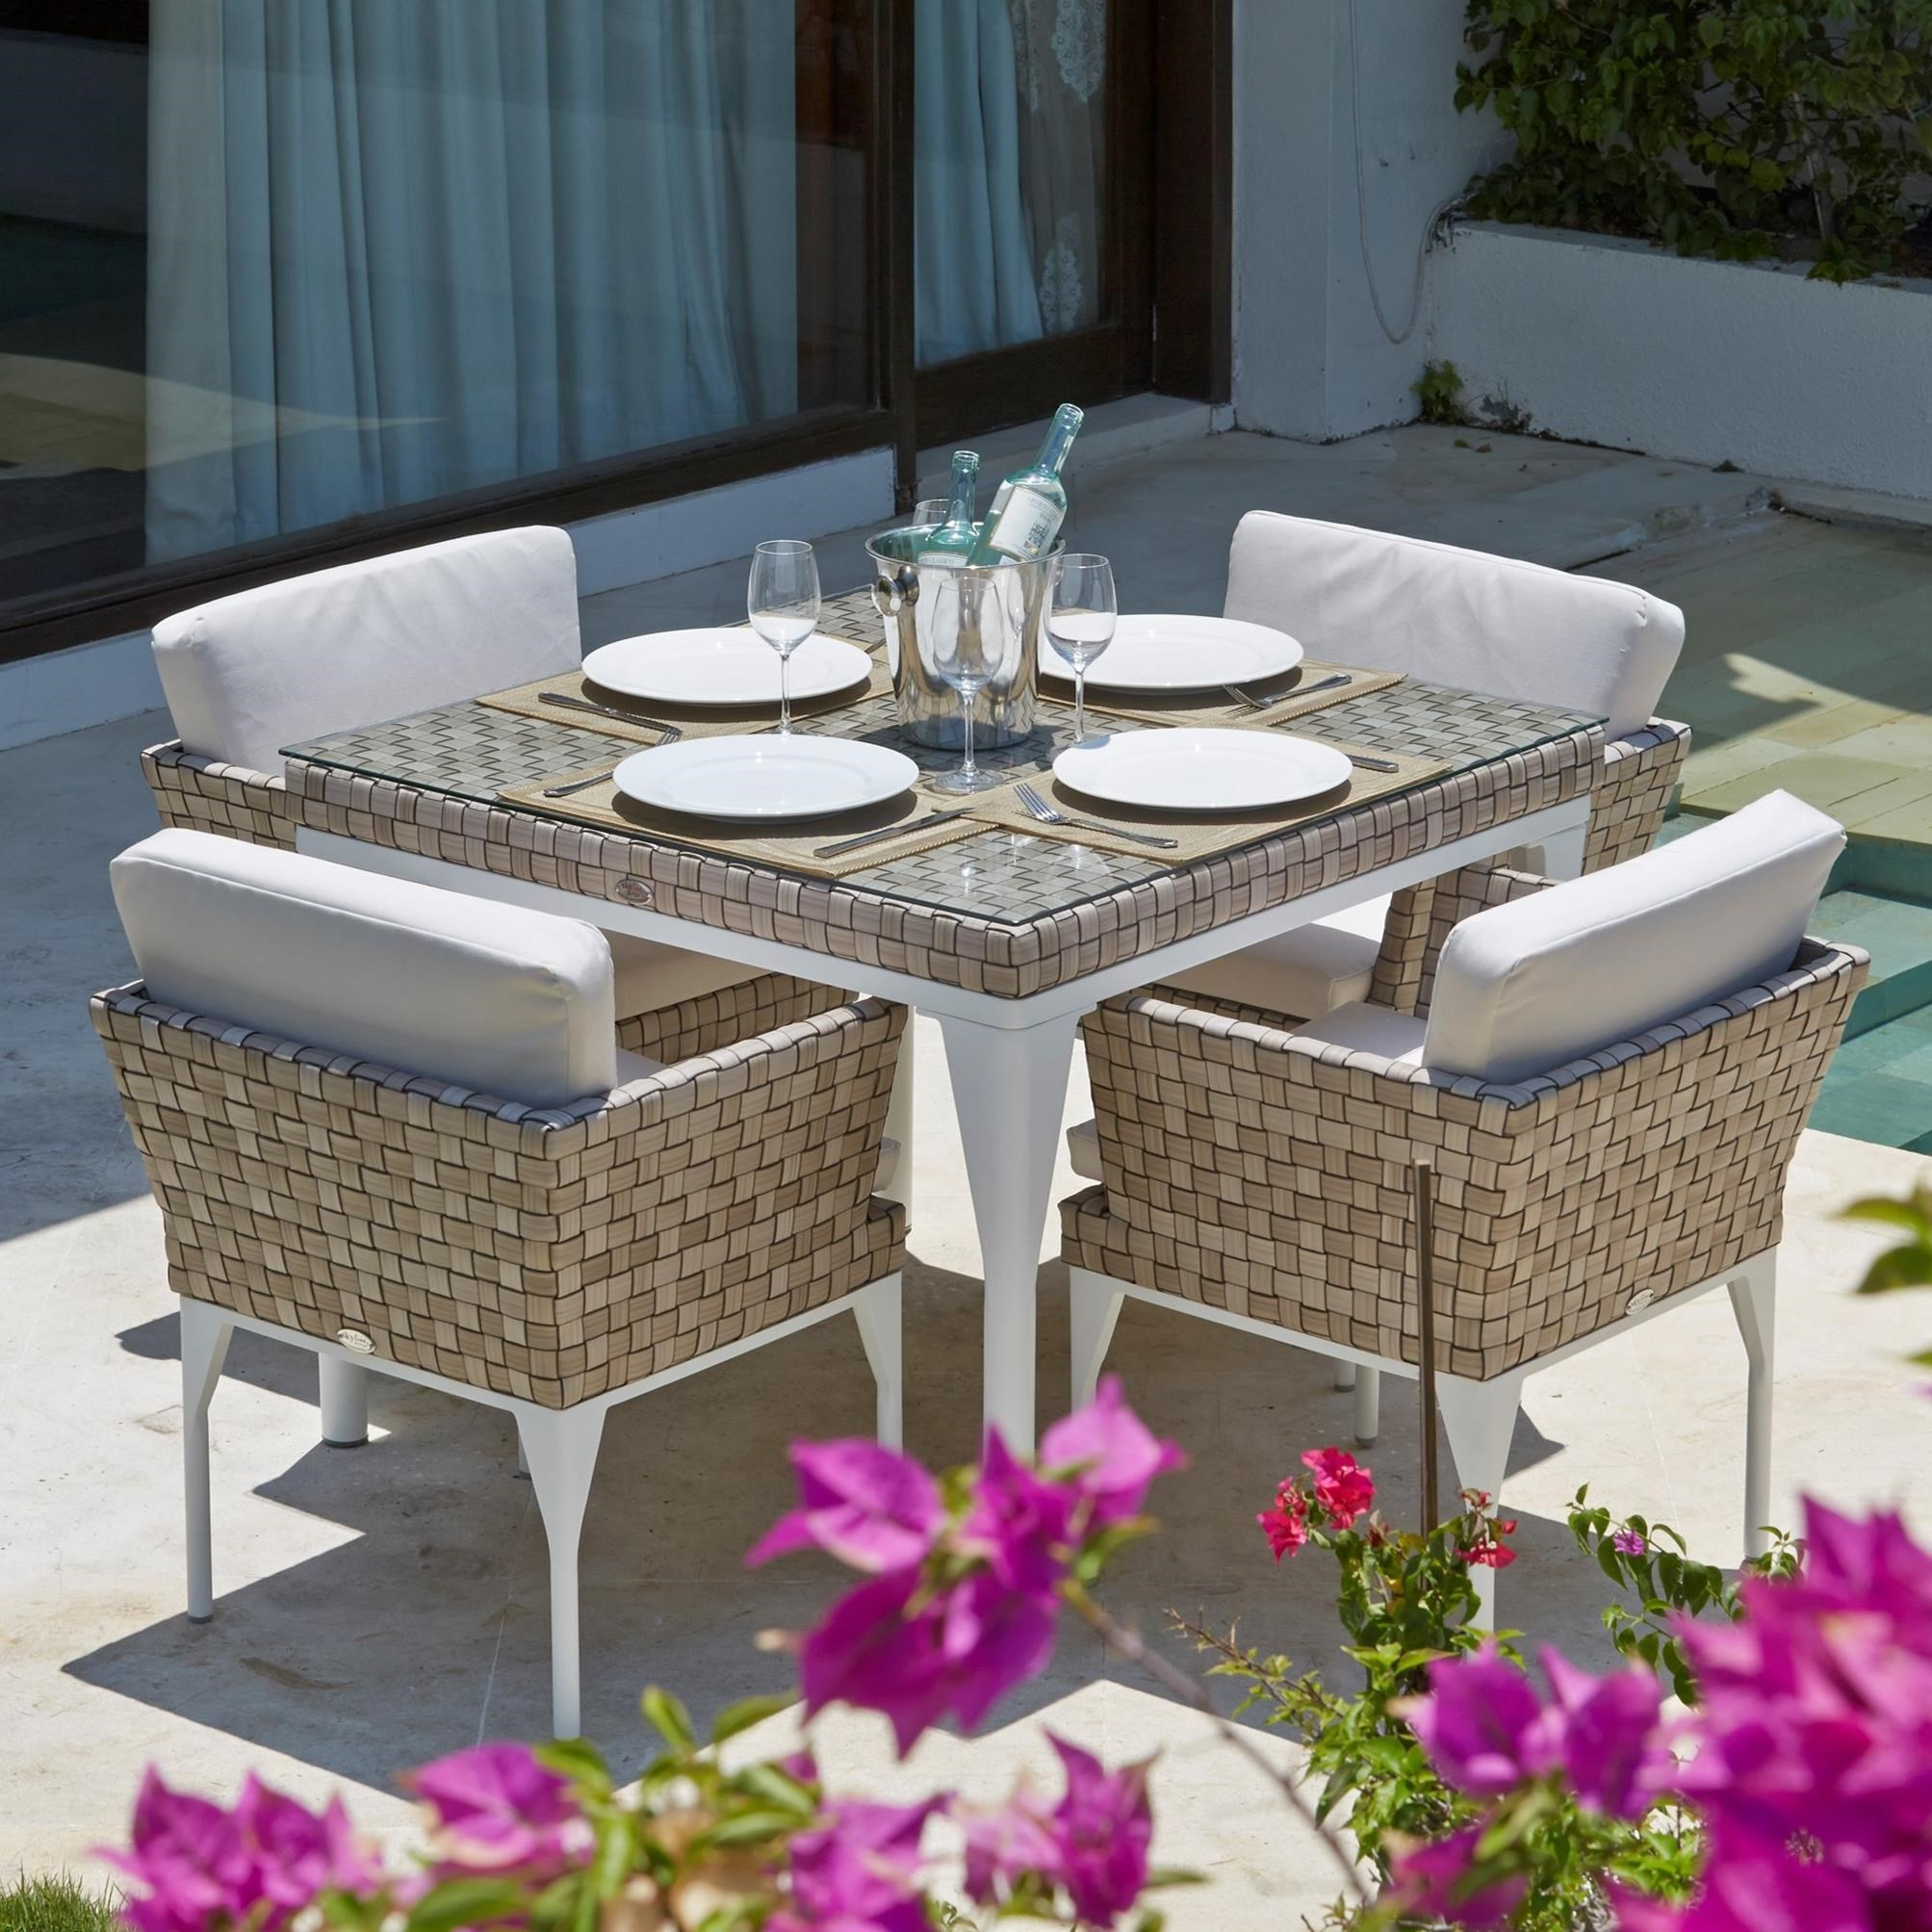 BRAFTA 5 Piece Outdoor Dining Set by Skyline Design at Baer's Furniture